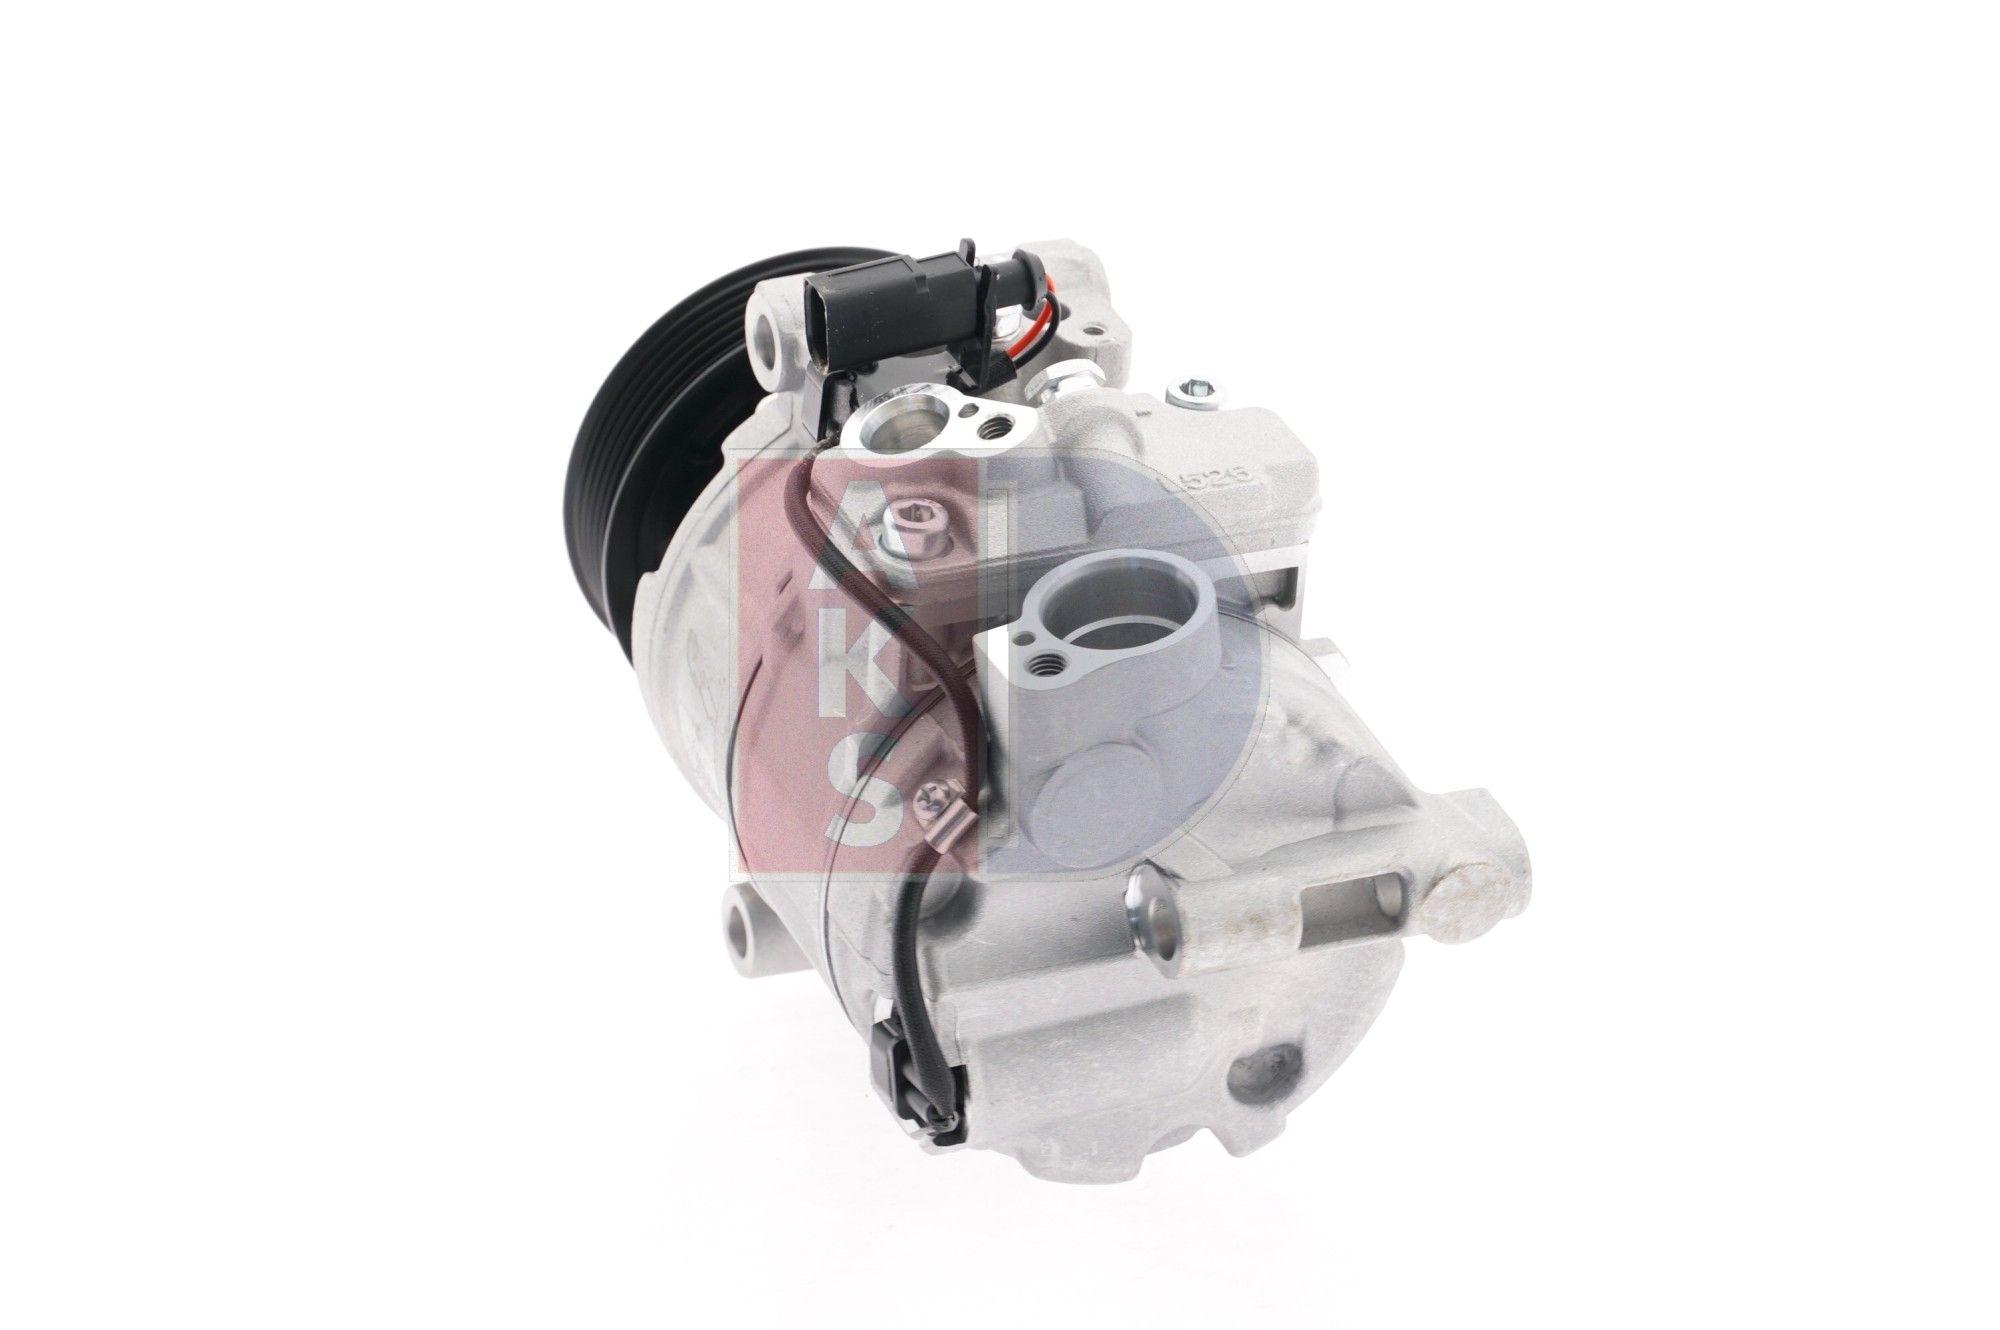 851658N Klimaanlage Kompressor AKS DASIS Erfahrung